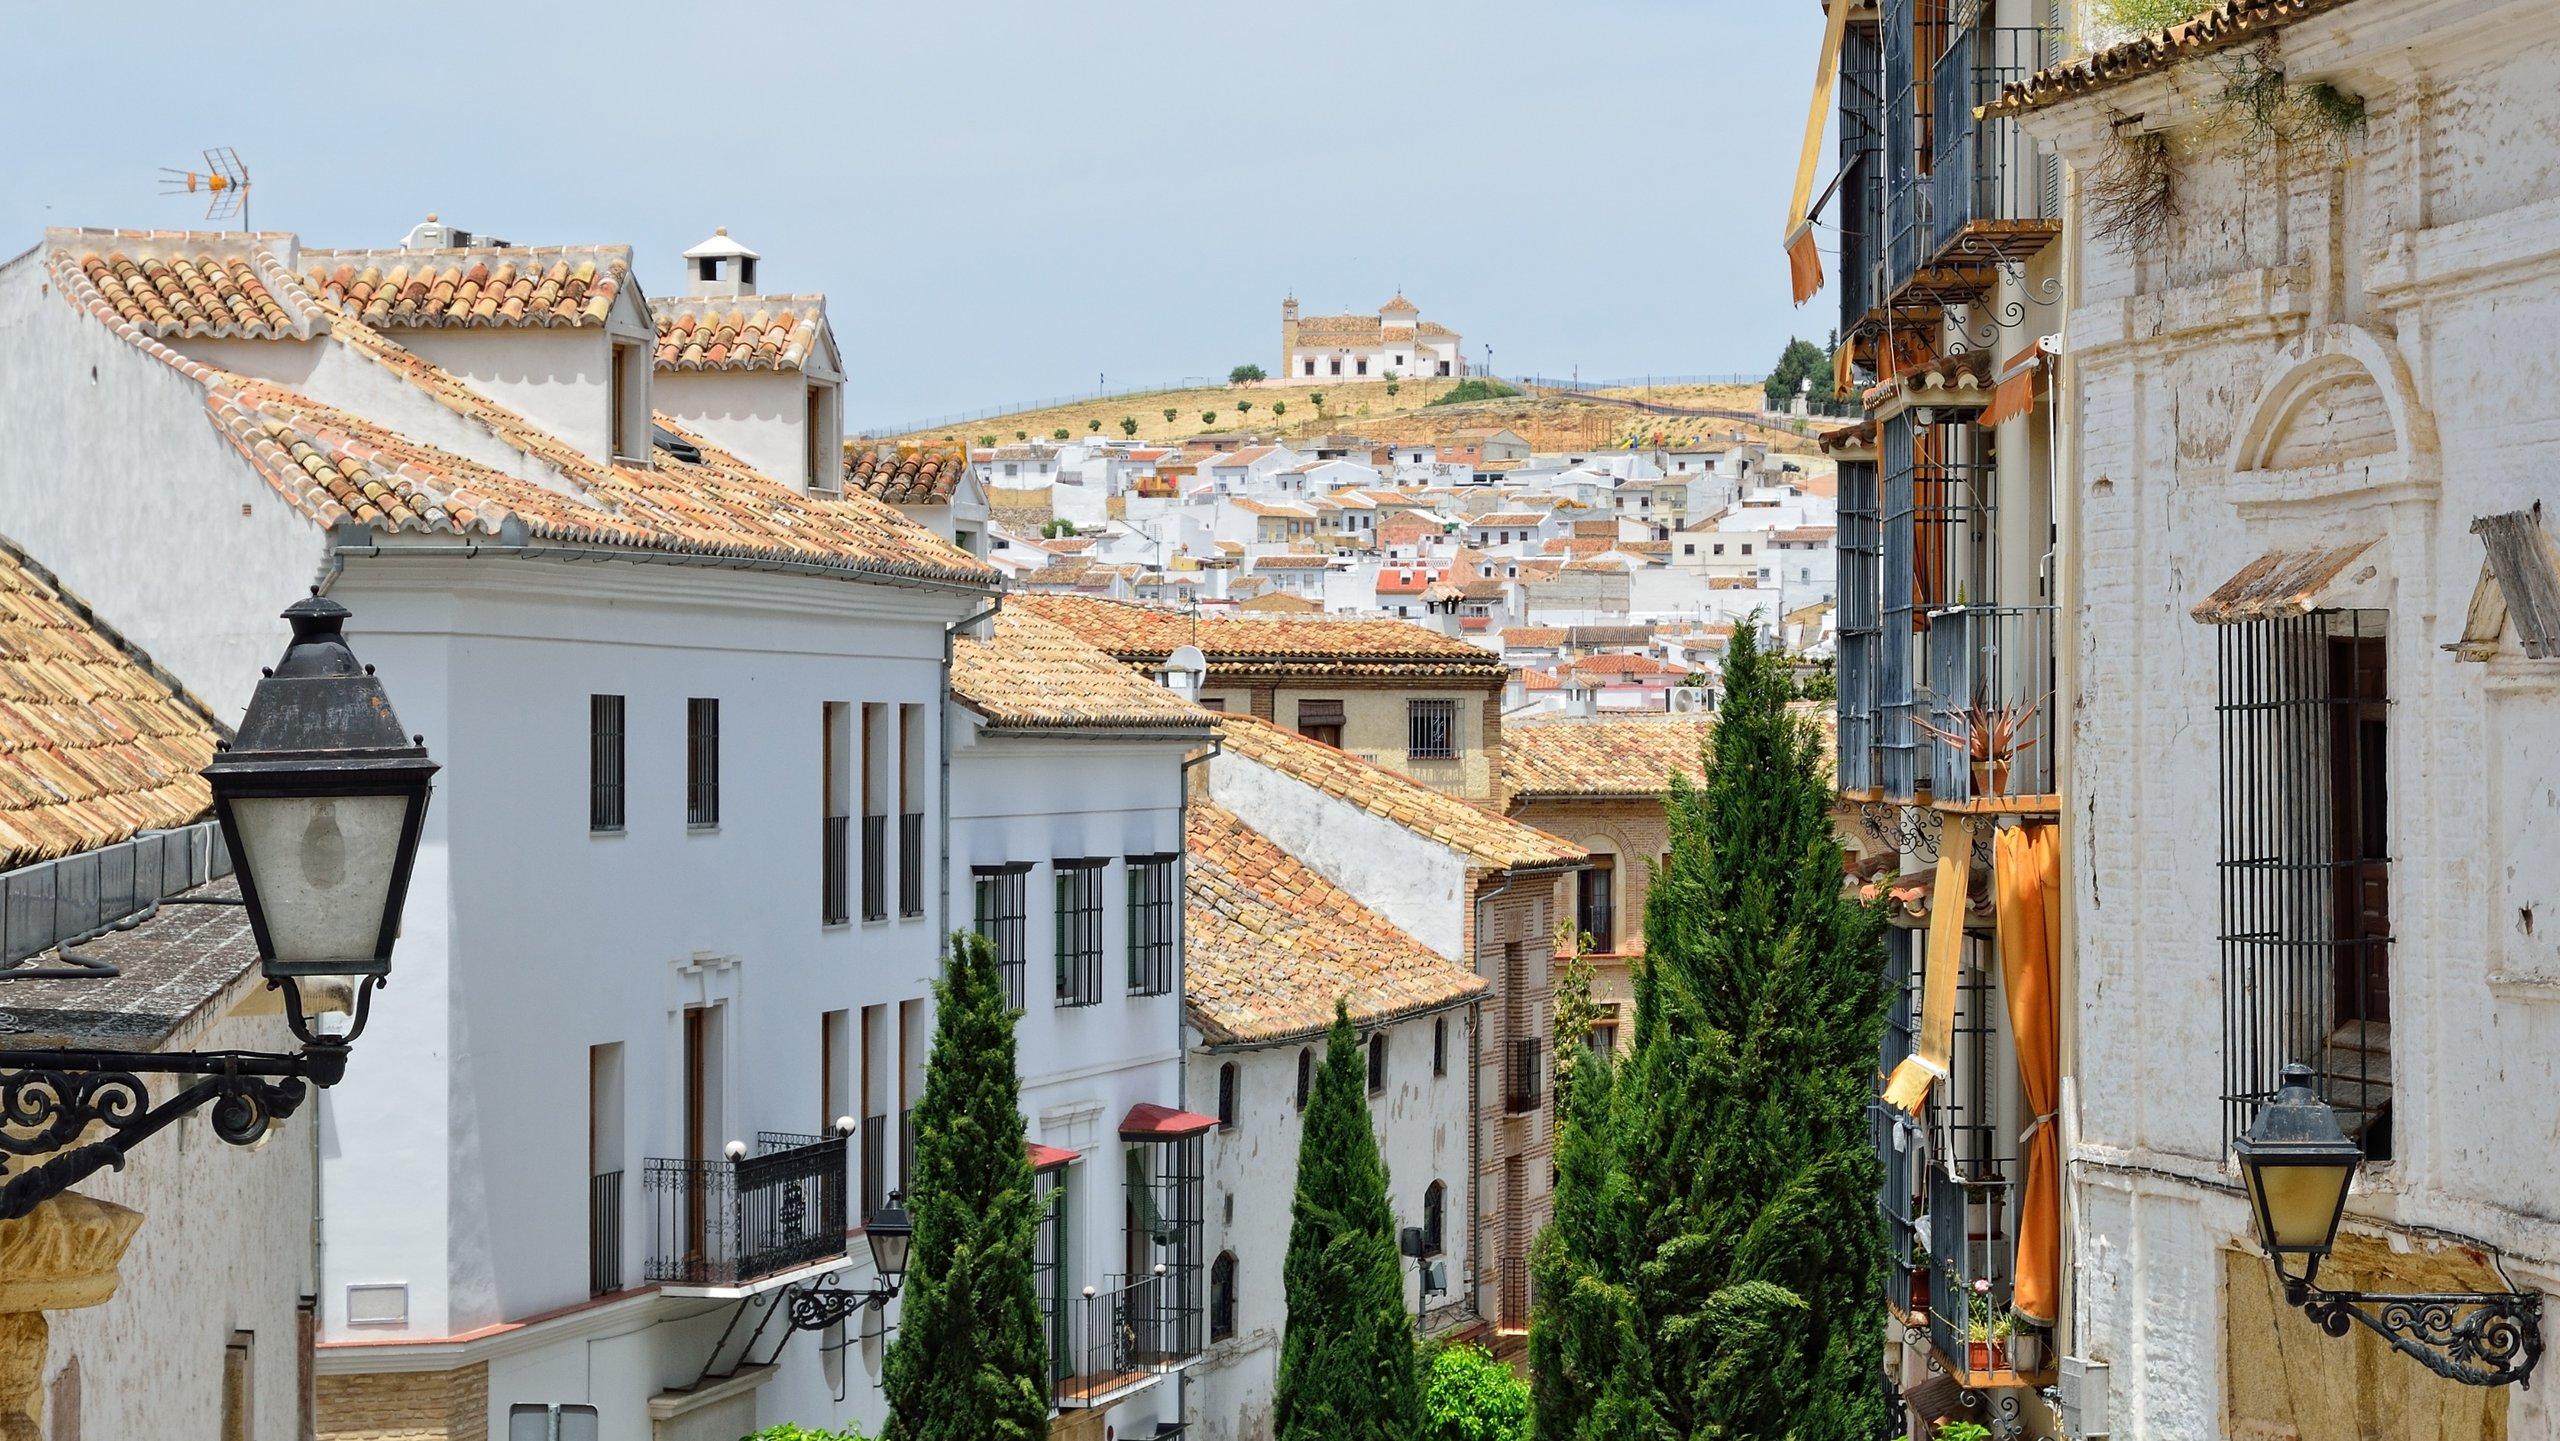 Comarca de Antequera, Andalusia, Spain